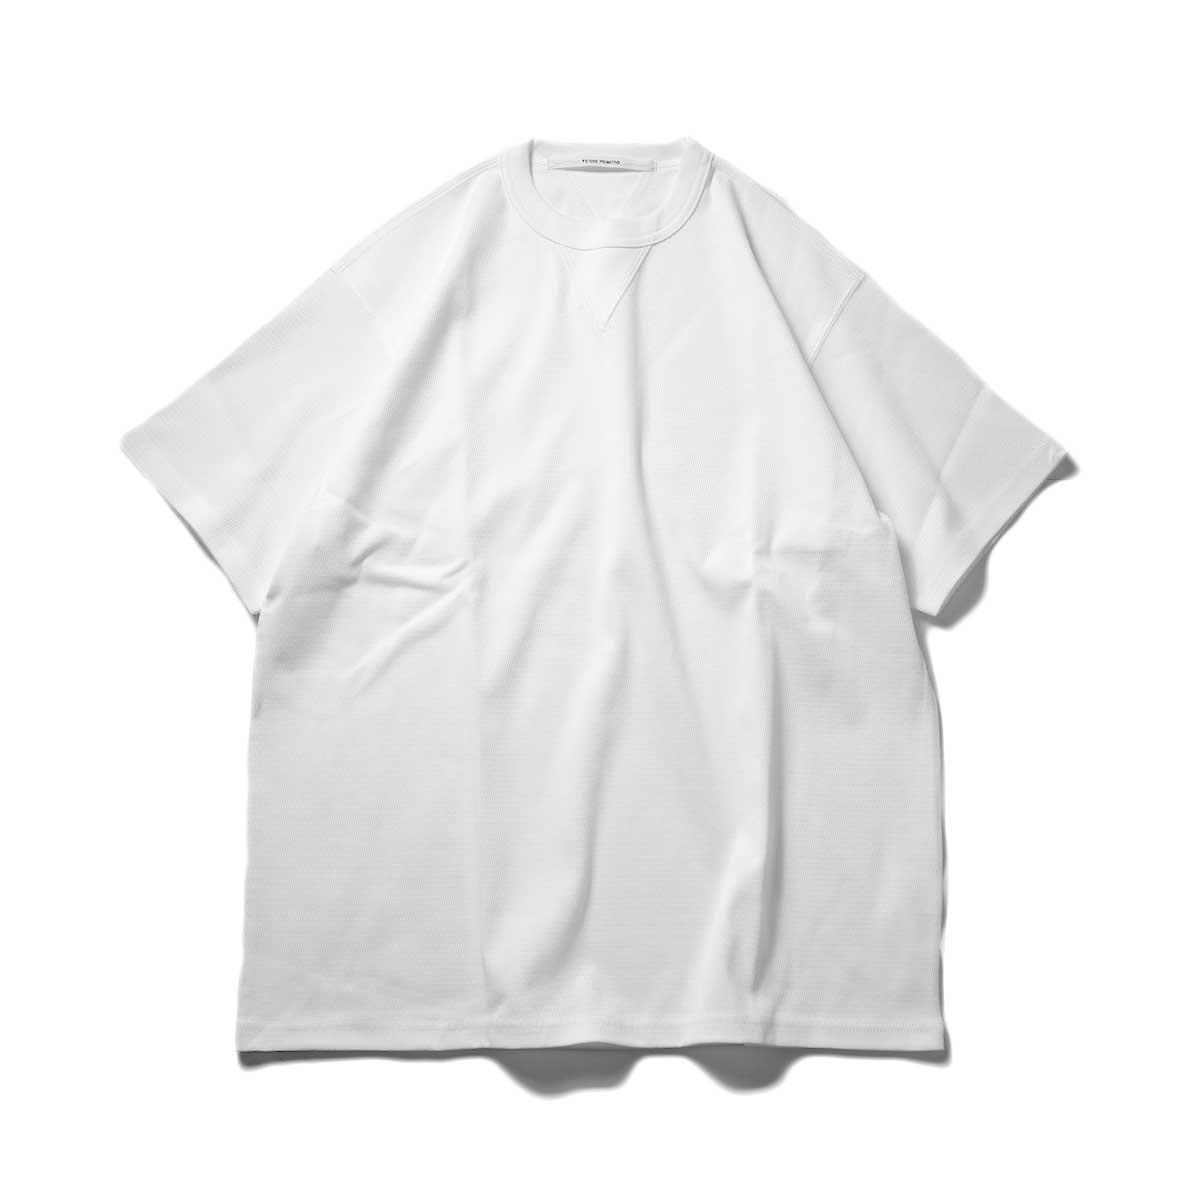 FUTURE PRIMITIVE / FP THERMAL V T-SHIRT (White)正面